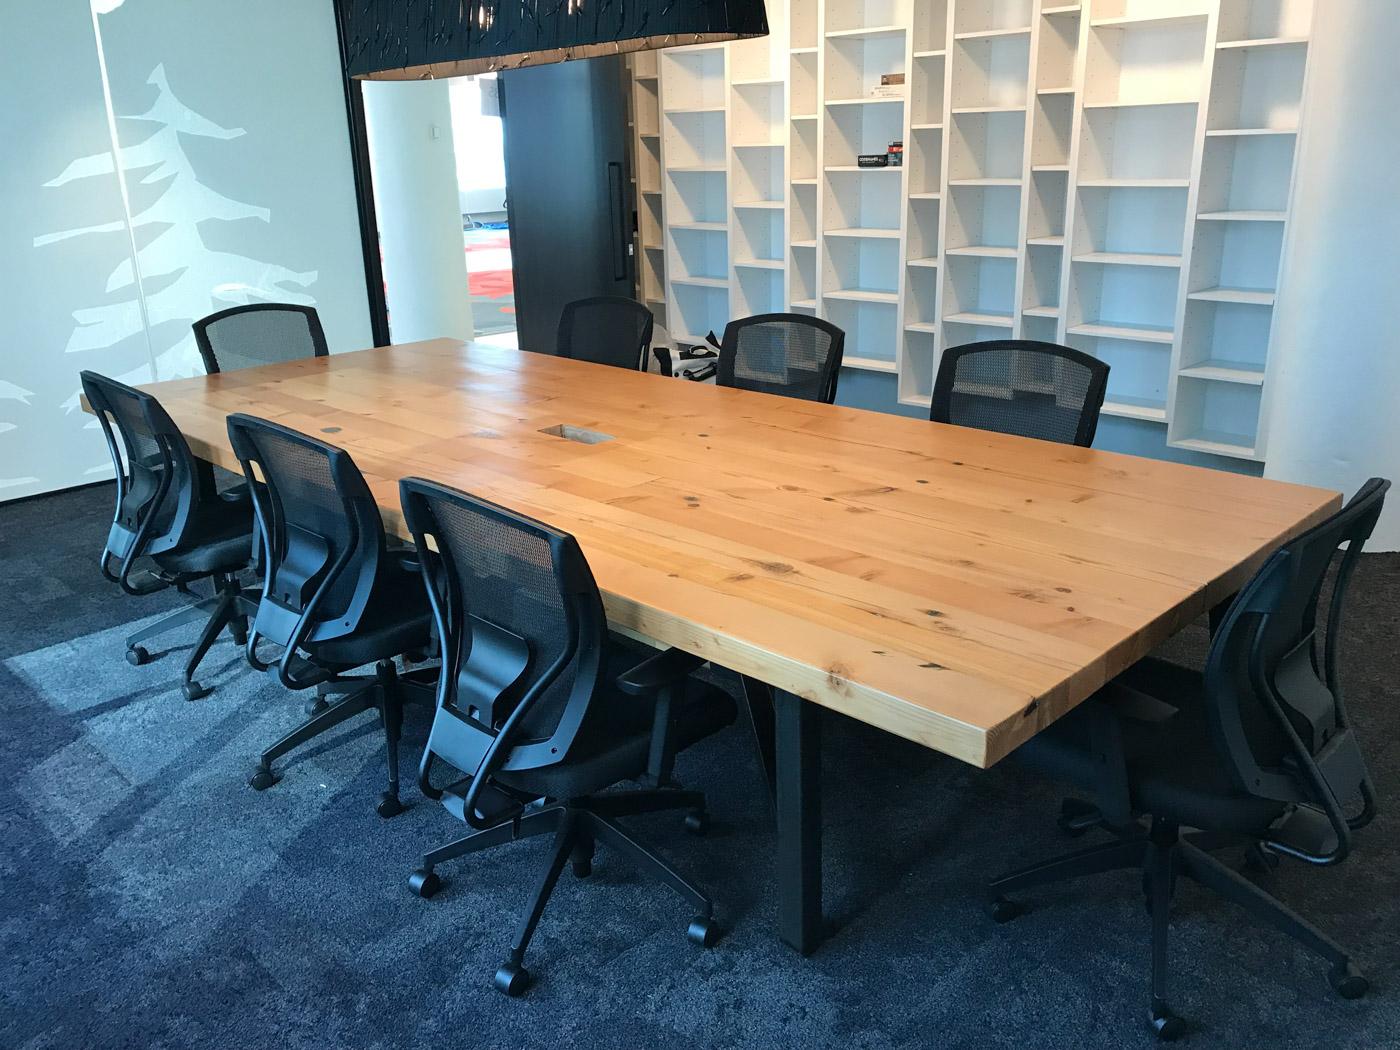 BeReclaimed - Reclaimed Wood Table - Douglas Fir on Steel Frame - Boardroom Ecobee Toronto.jpg